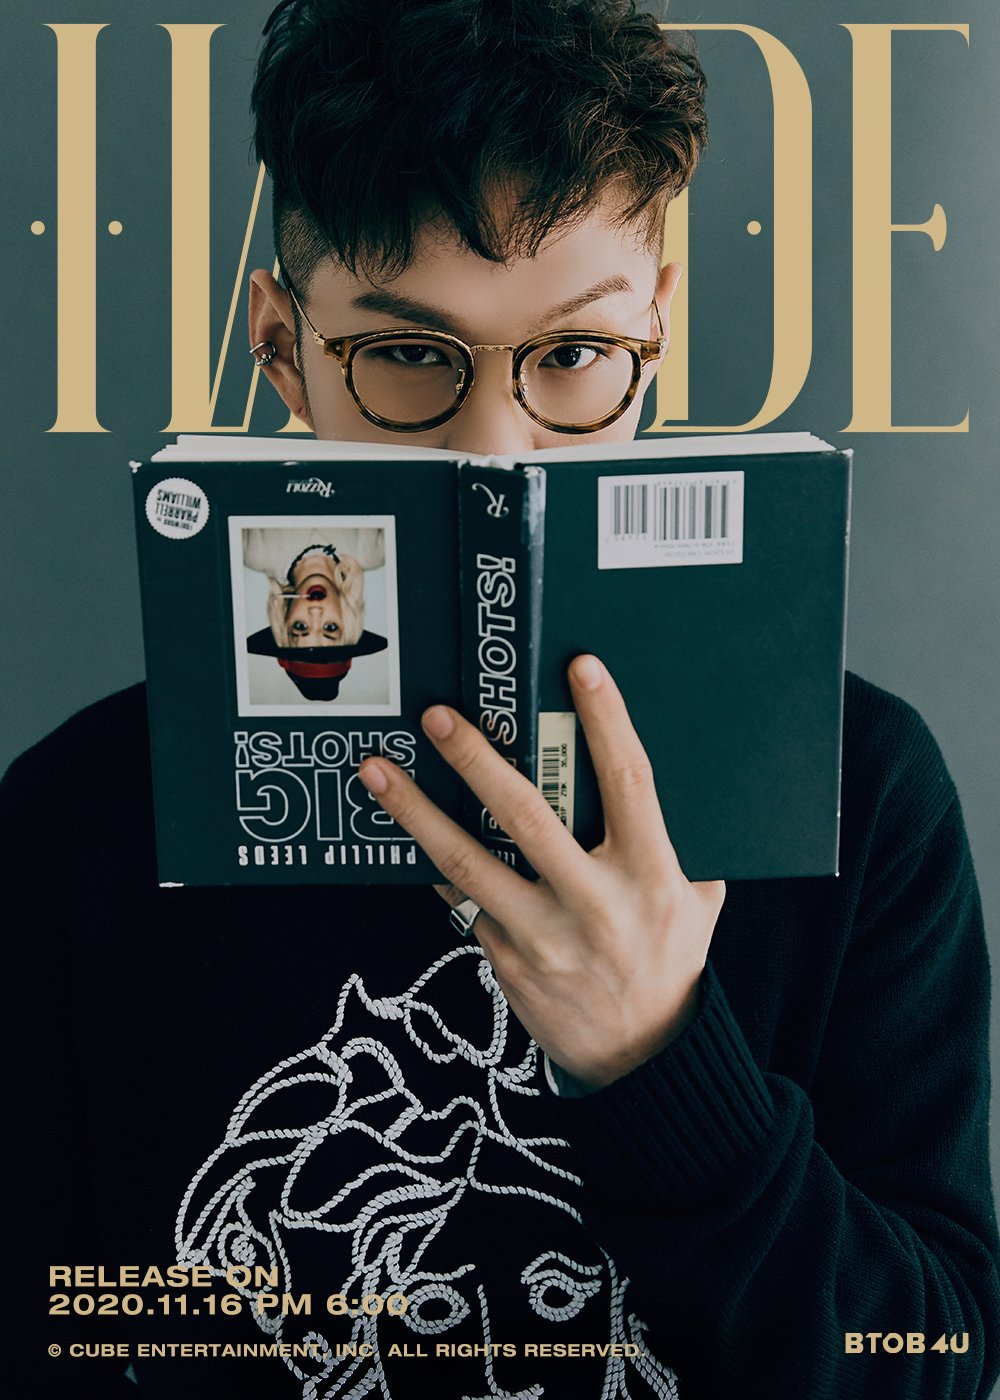 BTOB 4U 1st Mini Album Image Teaser - Lee Chang Sub